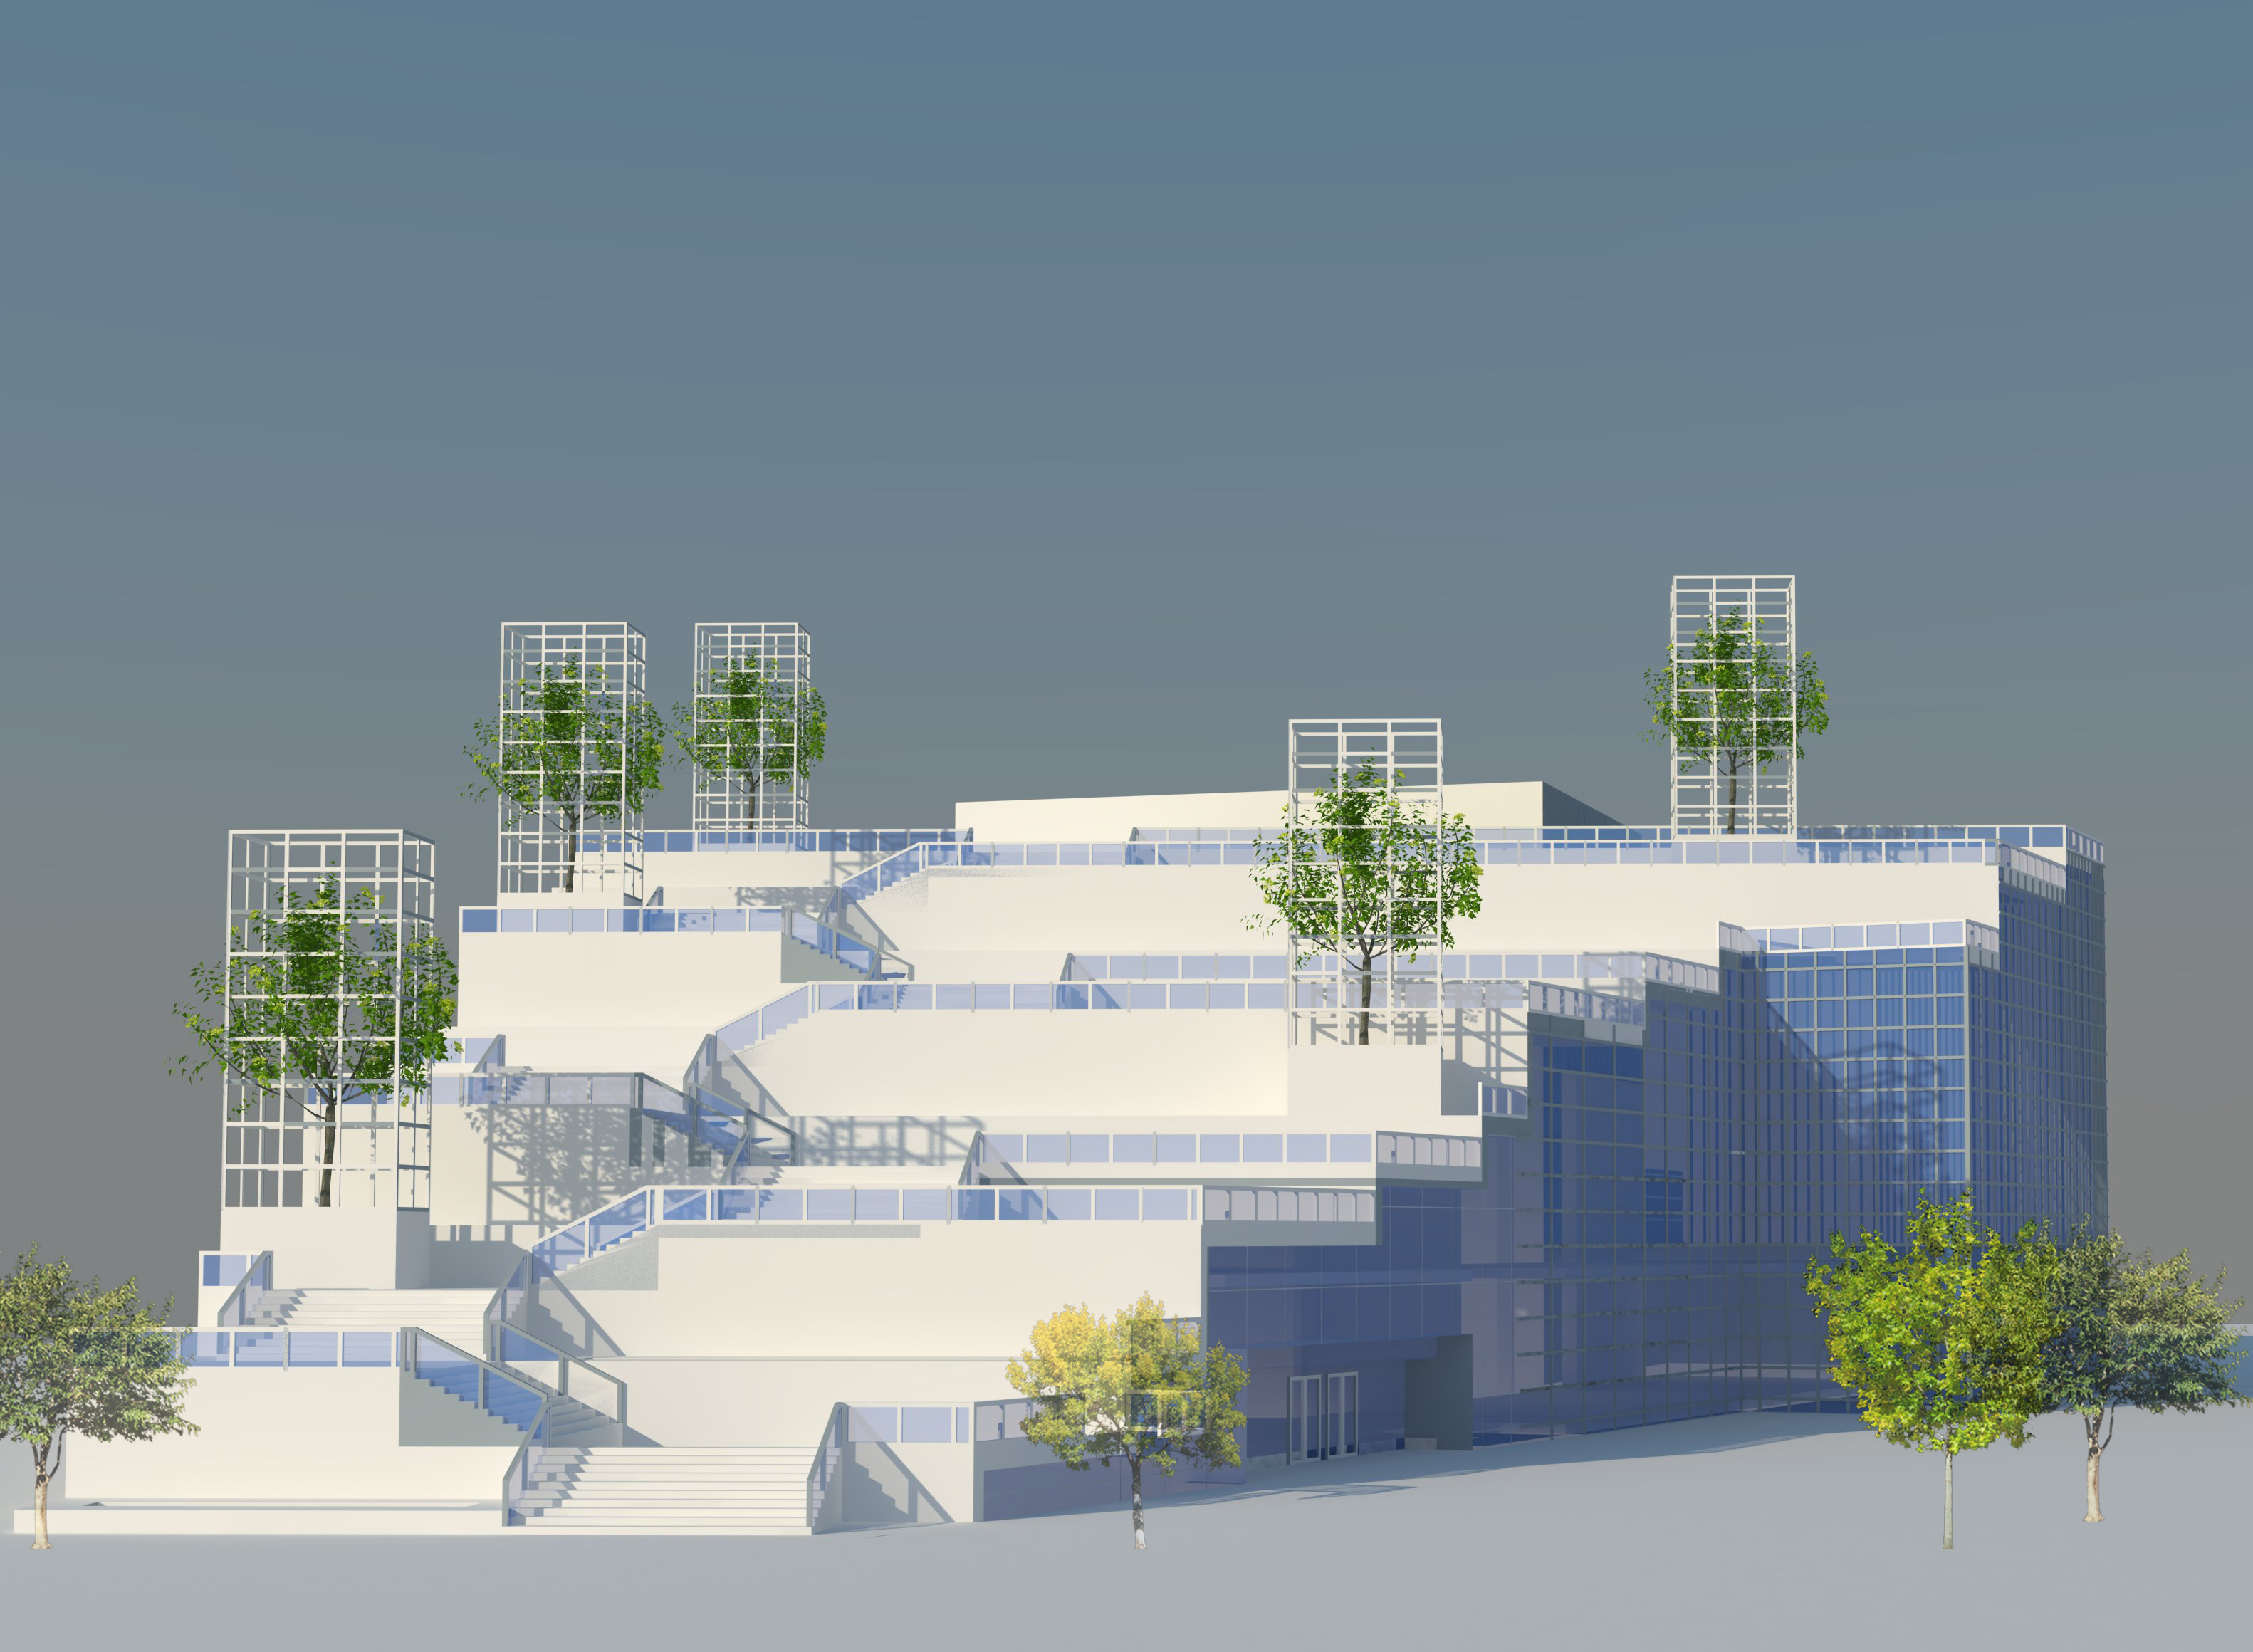 Разработка архитектурной концепции театра оперы и балета фото f_15752f0ce863025d.jpg